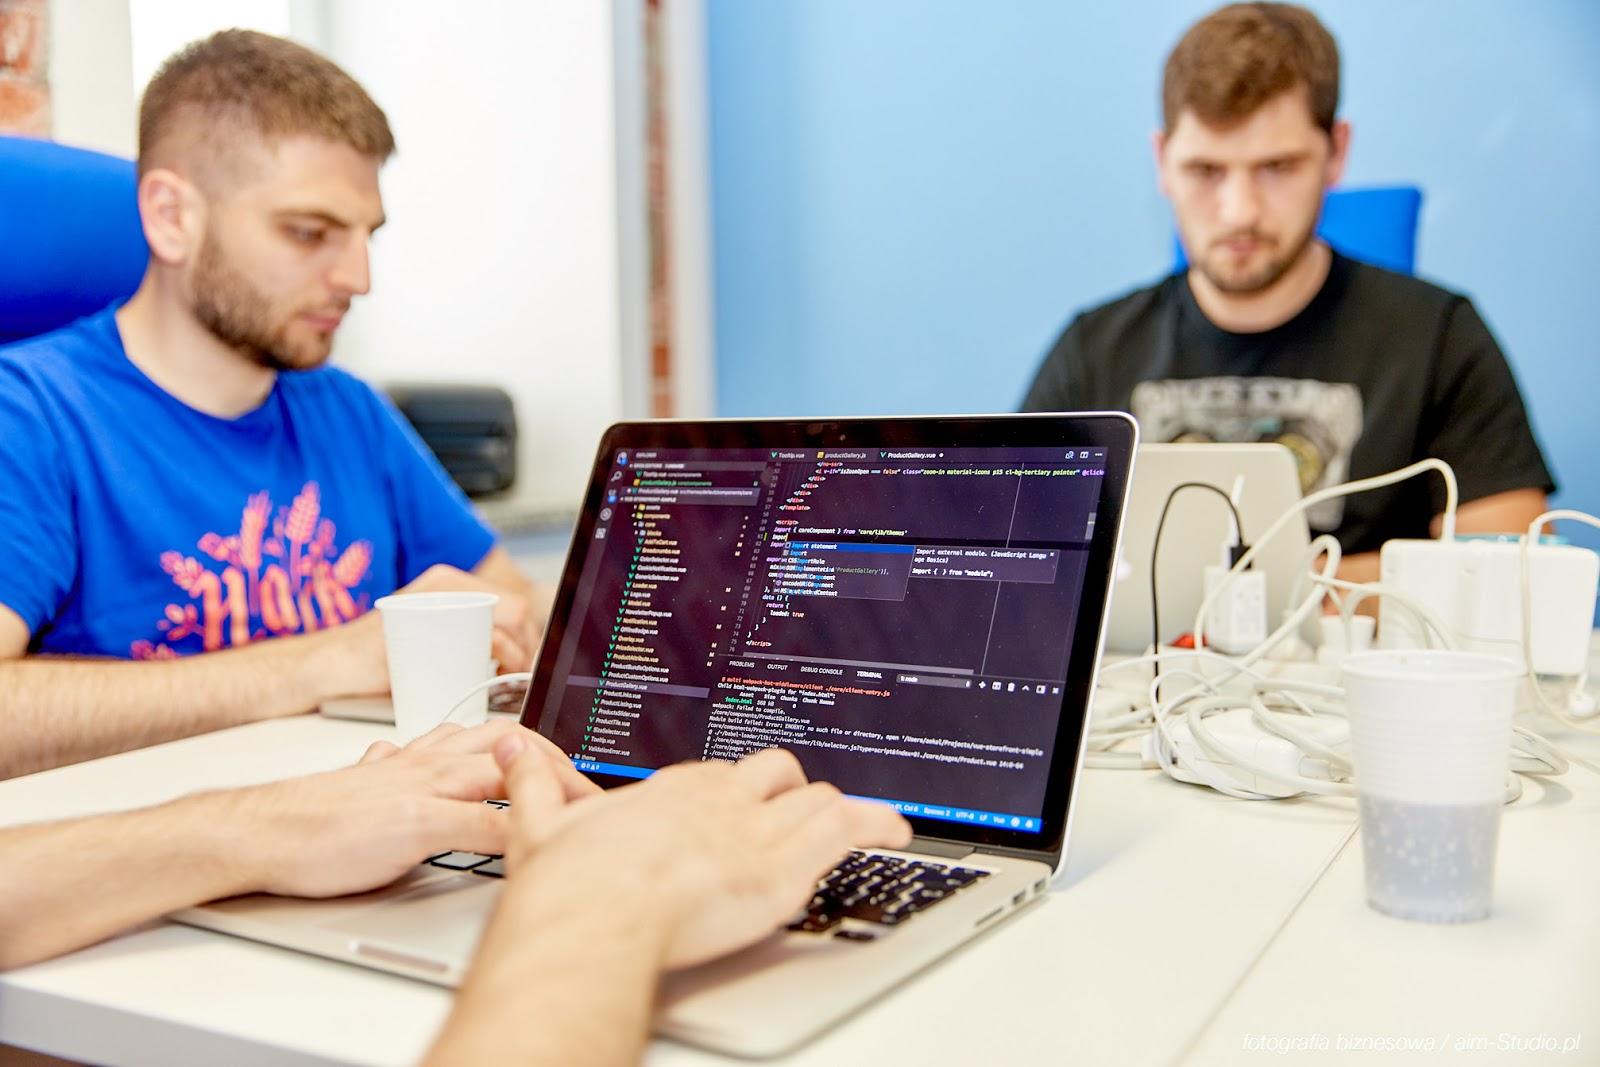 PWA business - how important is developer experience? | Divante